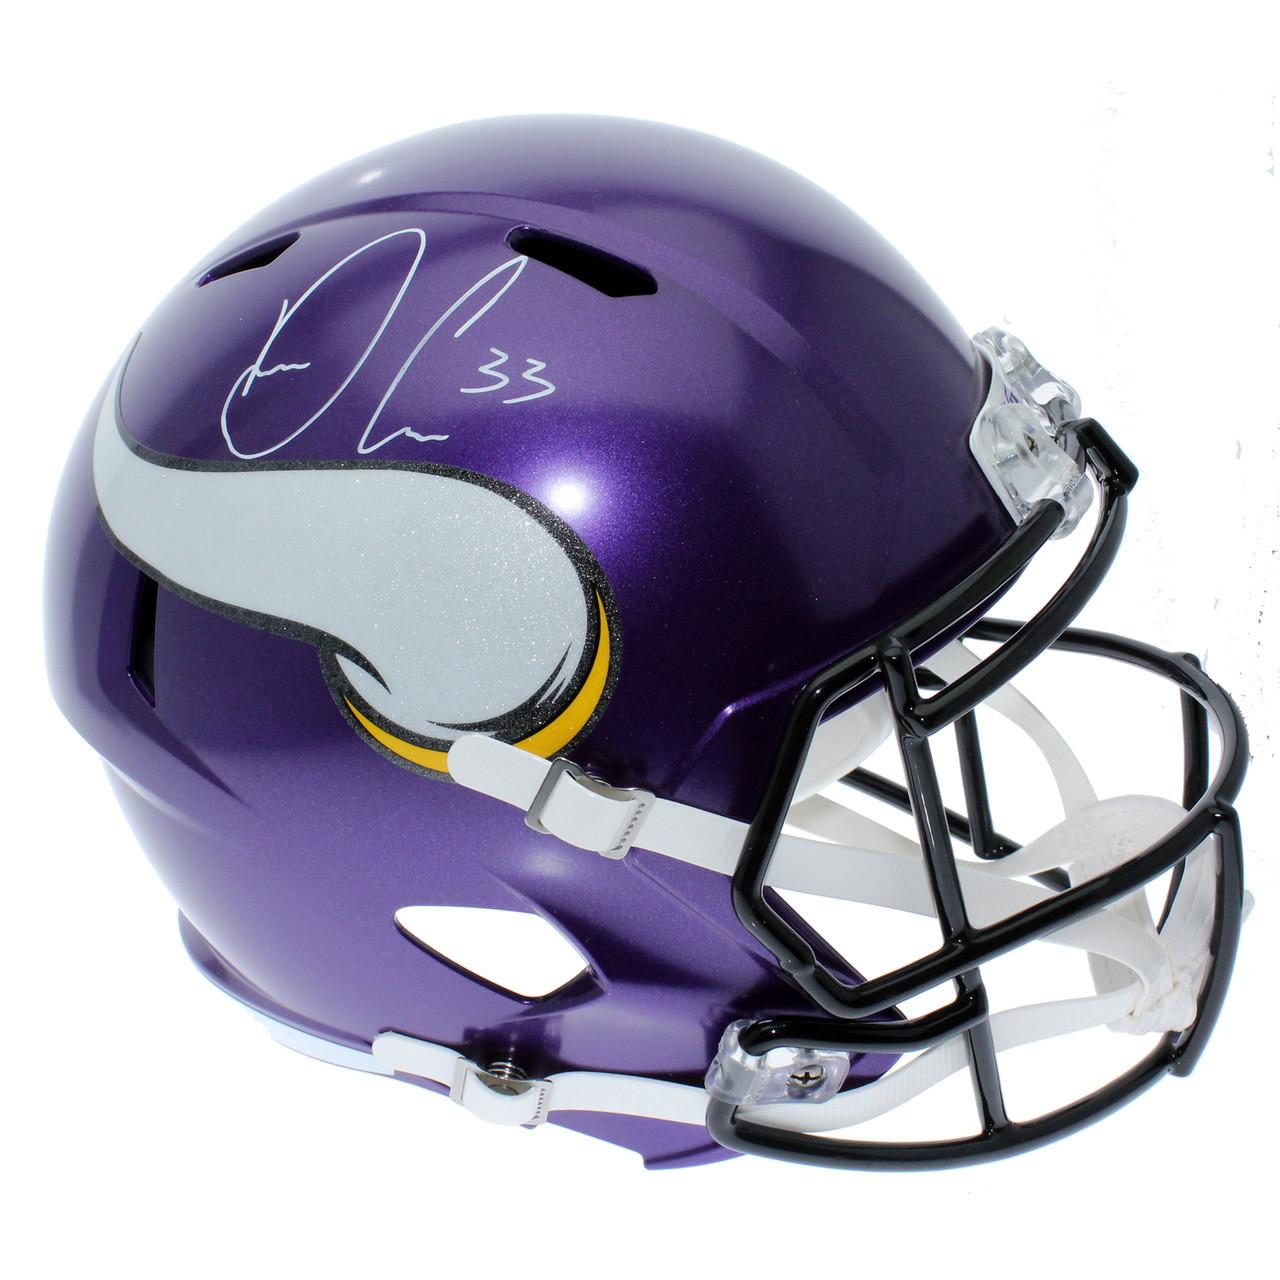 cb7b489c Dalvin Cook Autographed Signed Minnesota Vikings Riddell Full Size Speed  Replica Helmet - JSA Authentication